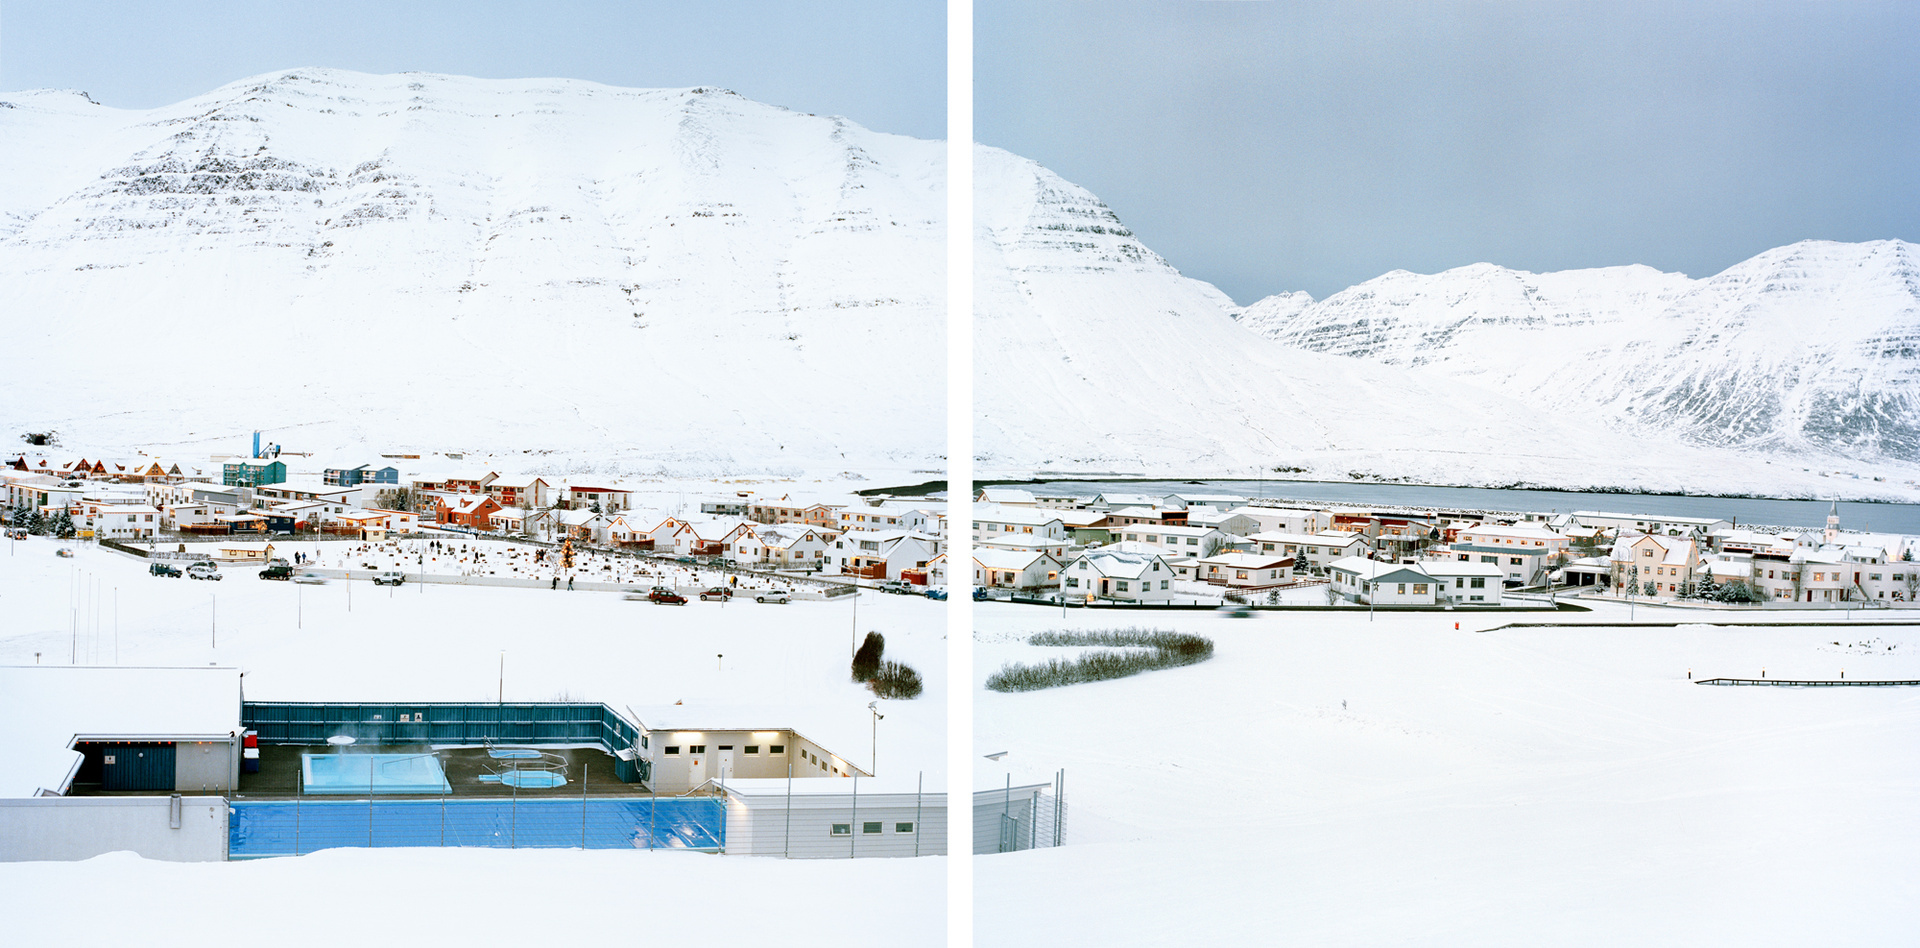 Iceland - Olafsfjör∂ur